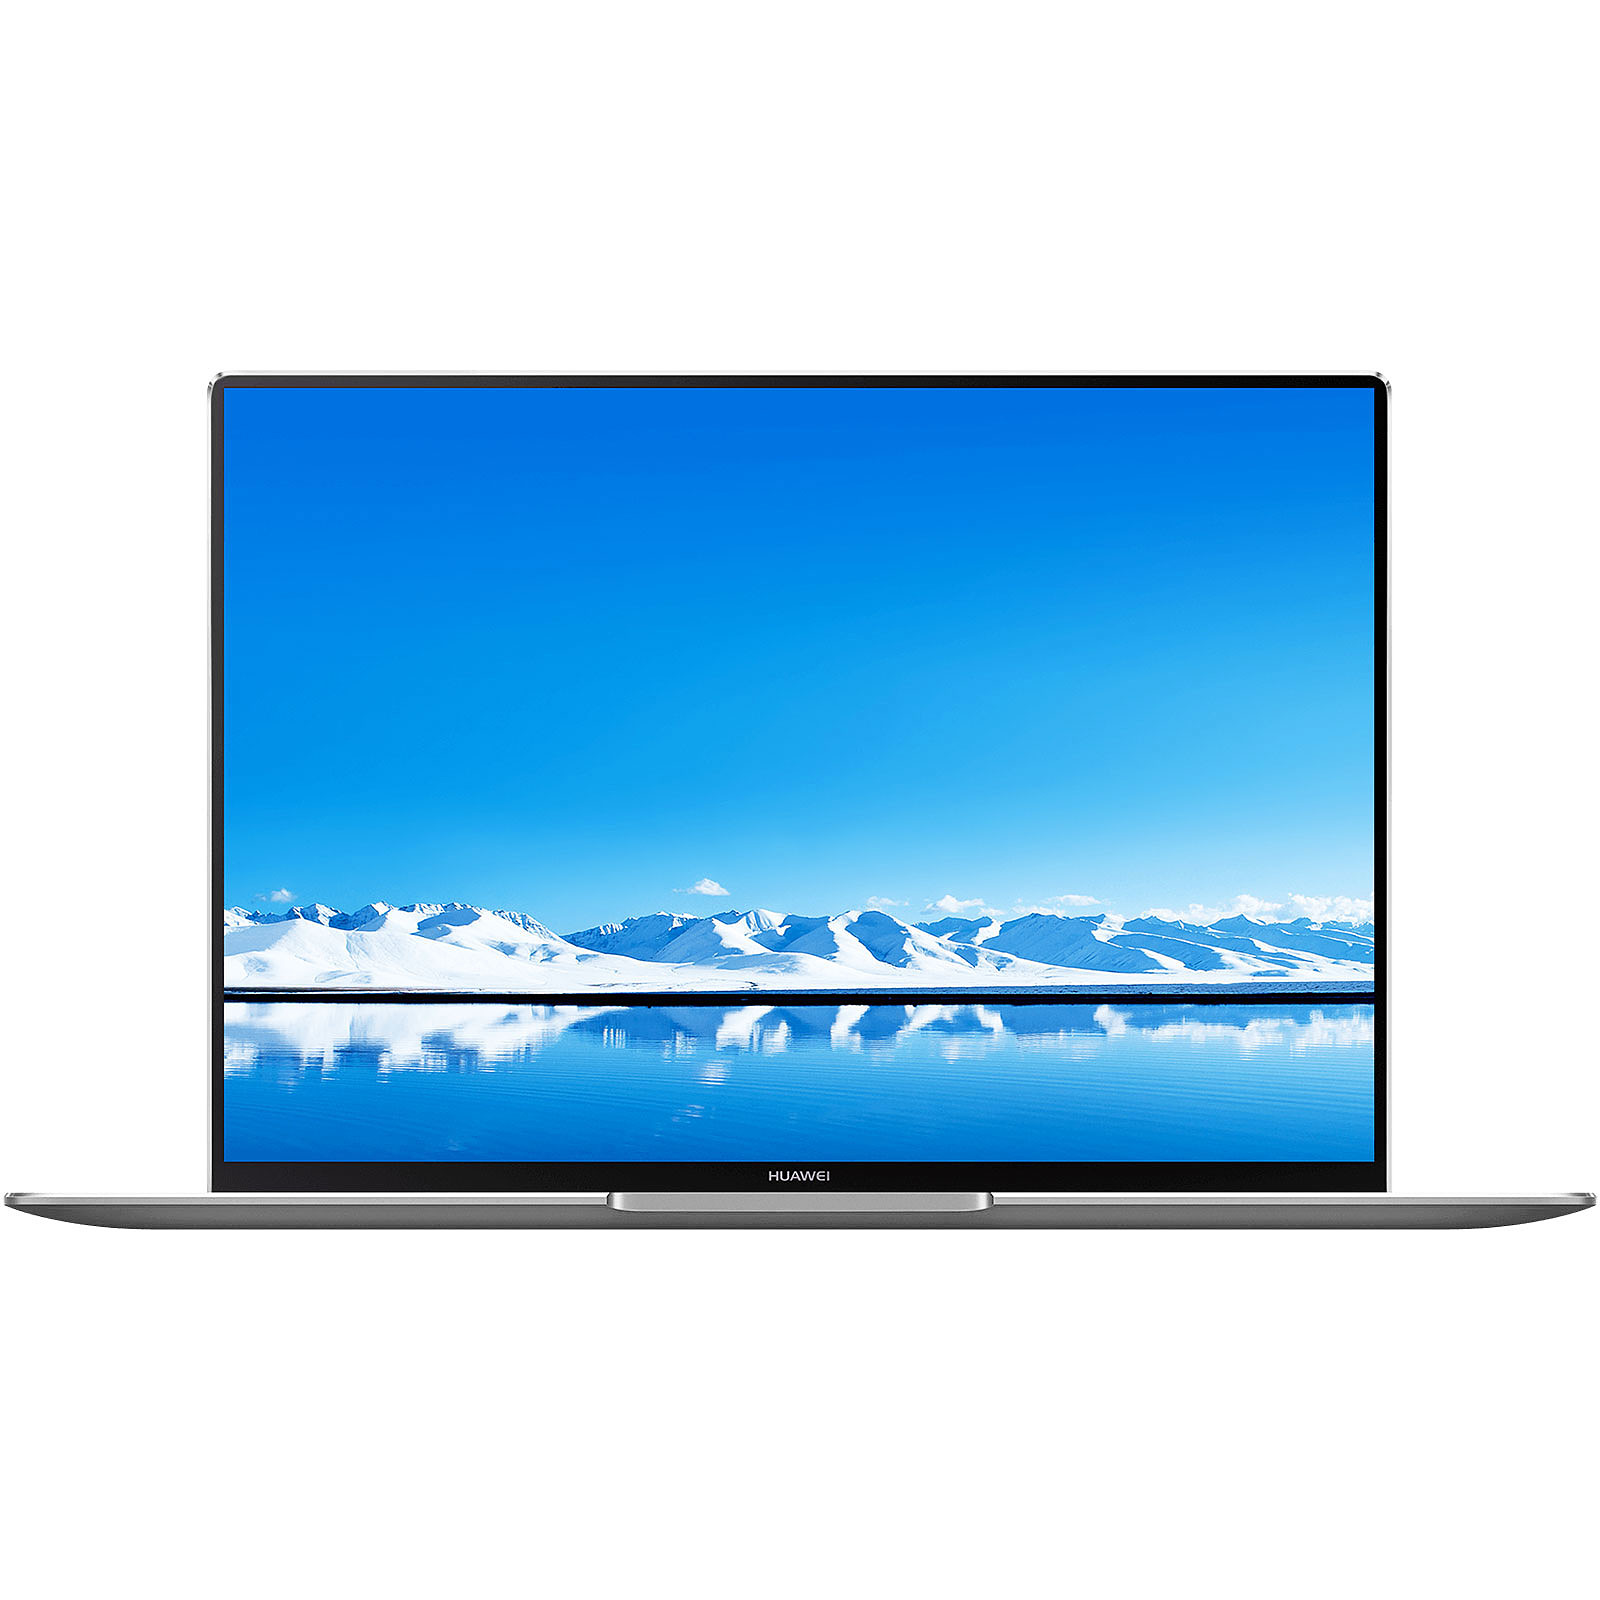 Huawei MateBook X Pro - Argent (53010CYY)